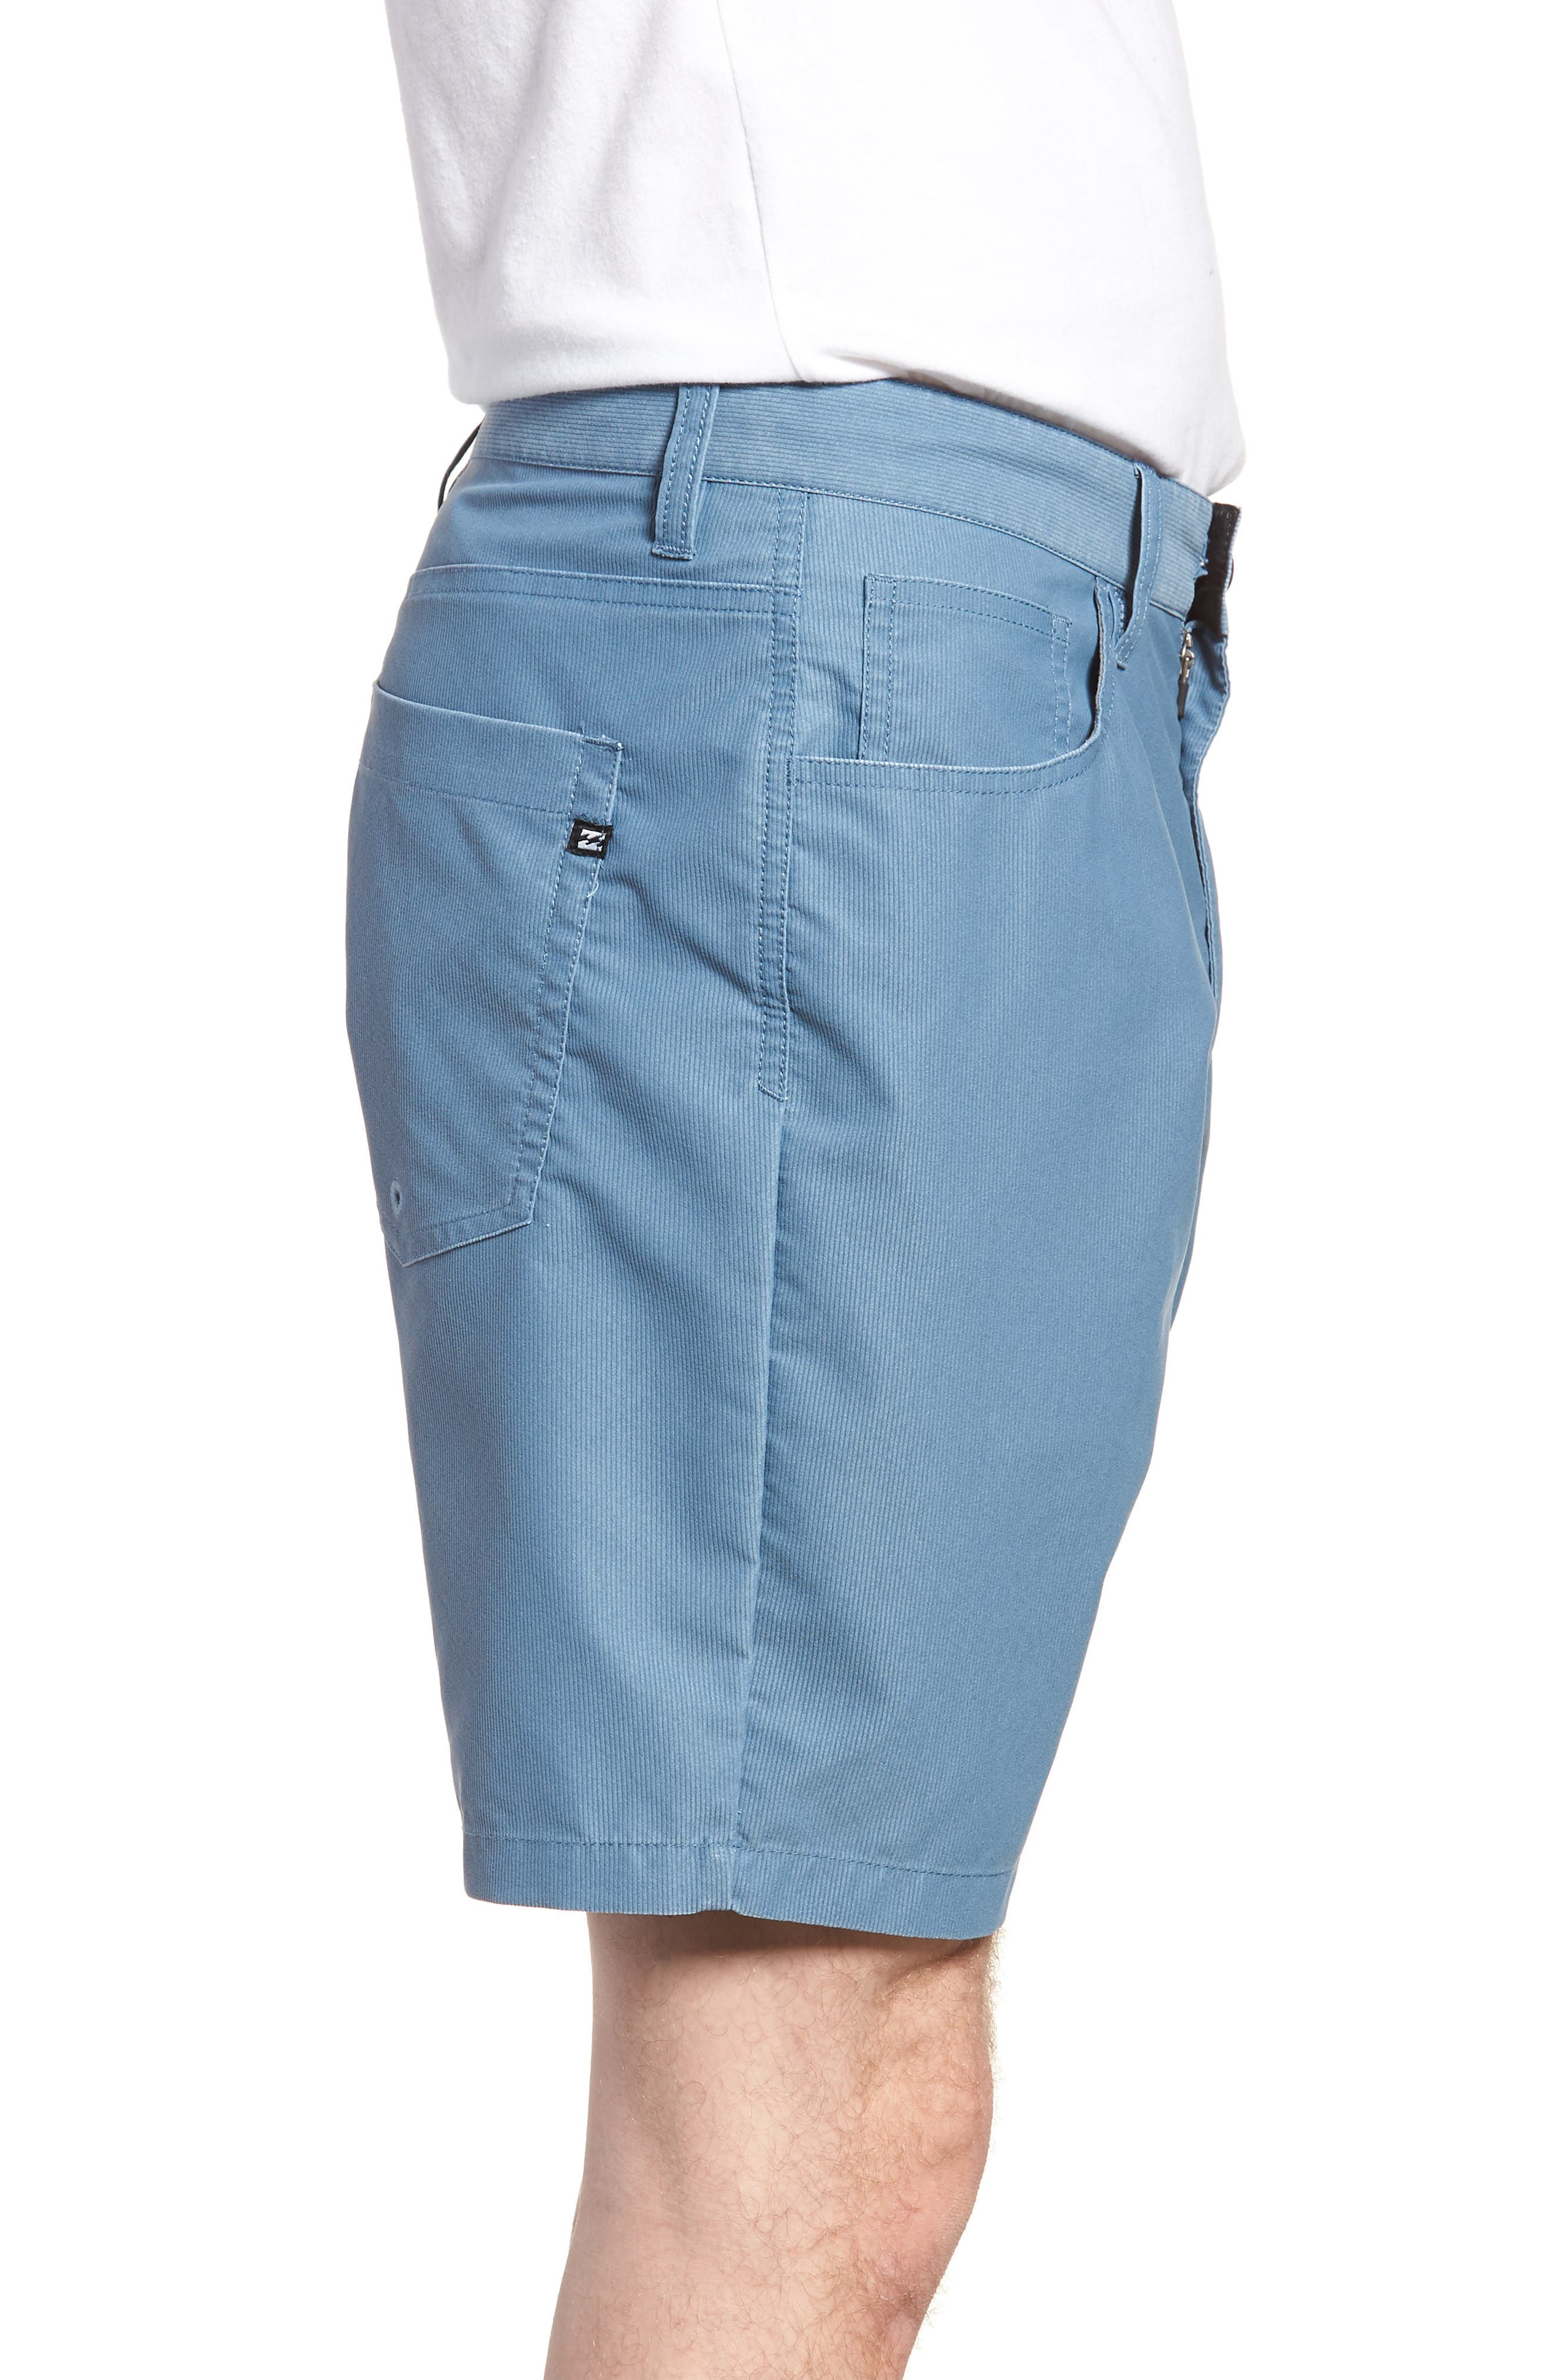 Outsider X Surf Corduroy Shorts,                             Alternate thumbnail 3, color,                             Powder Blue